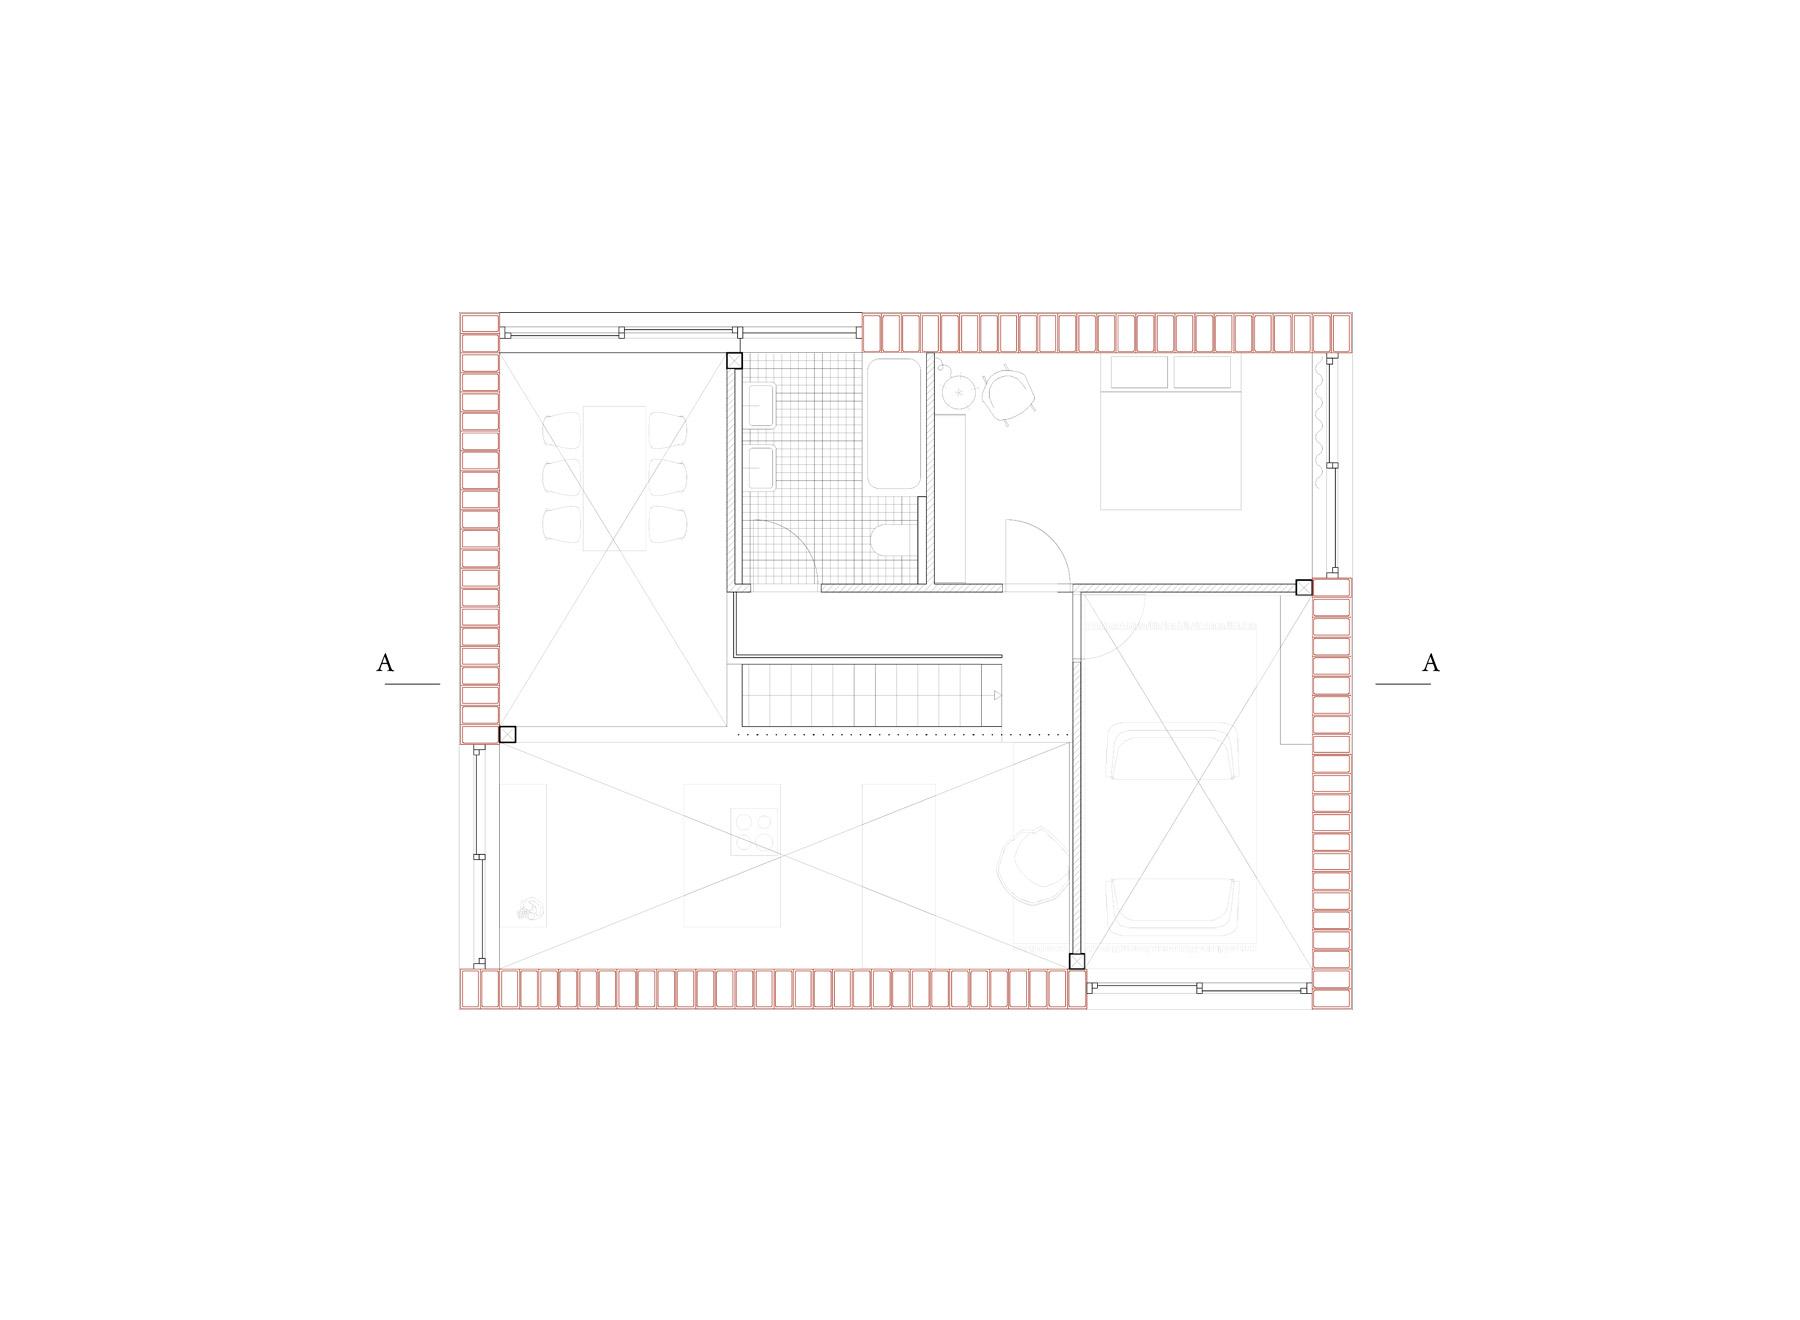 5/8 house, upper floor